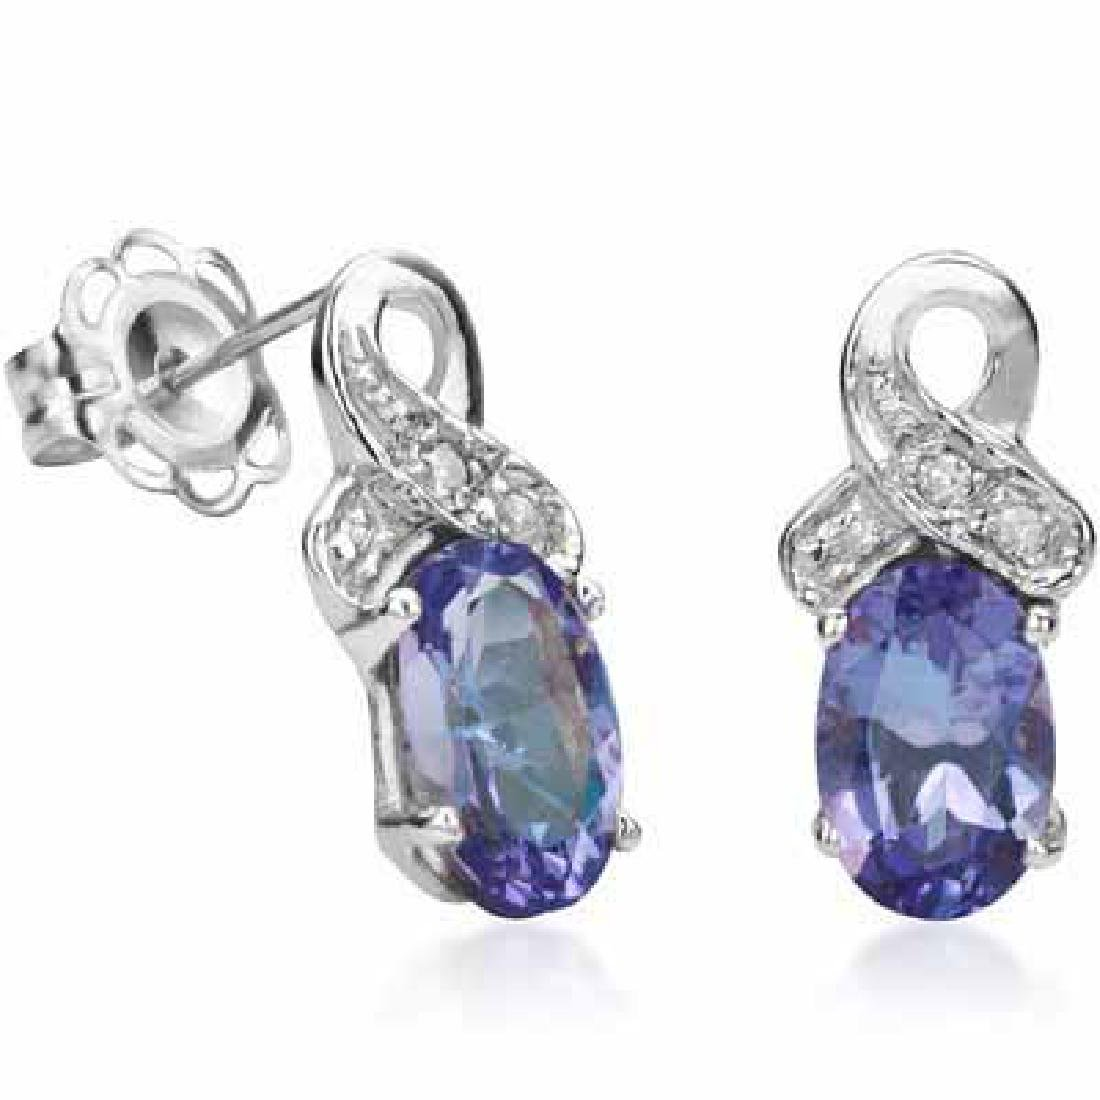 4/5 CARAT TANZANITE & DIAMOND 925 STERLING SILVER EARRI